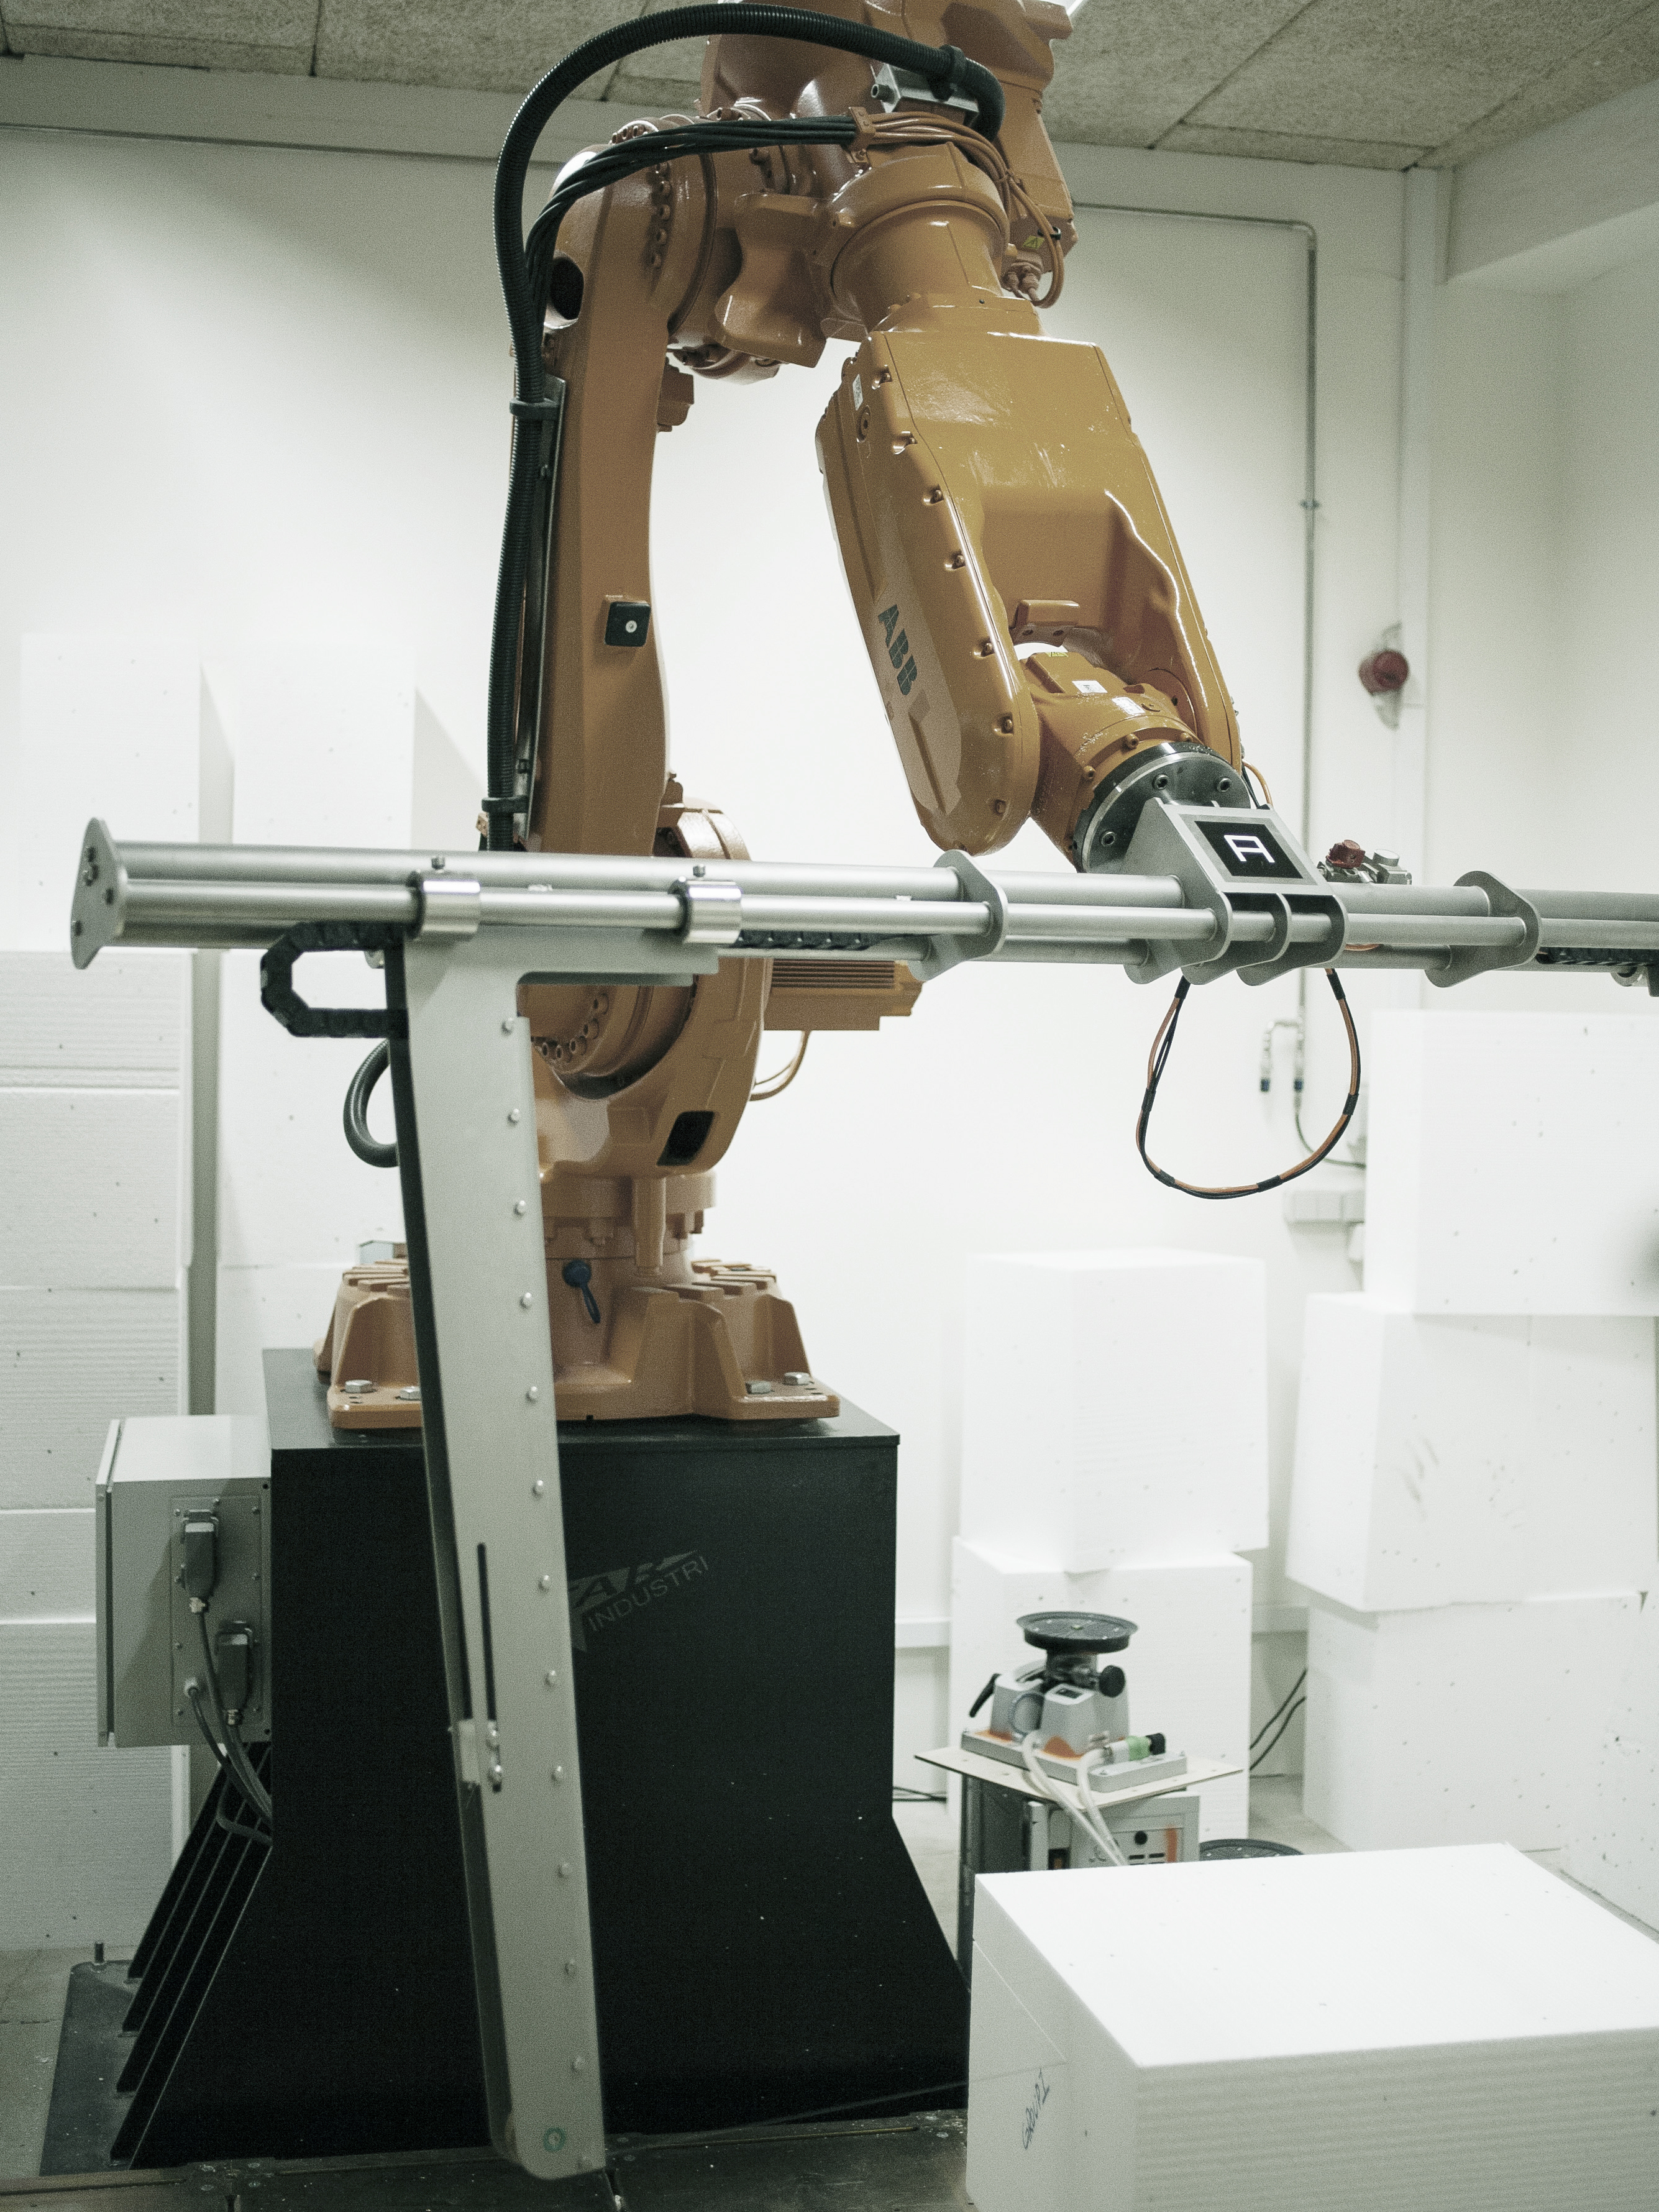 FOAM TO WOOD VENEER VIA ABB IRB 6620 ROBOT